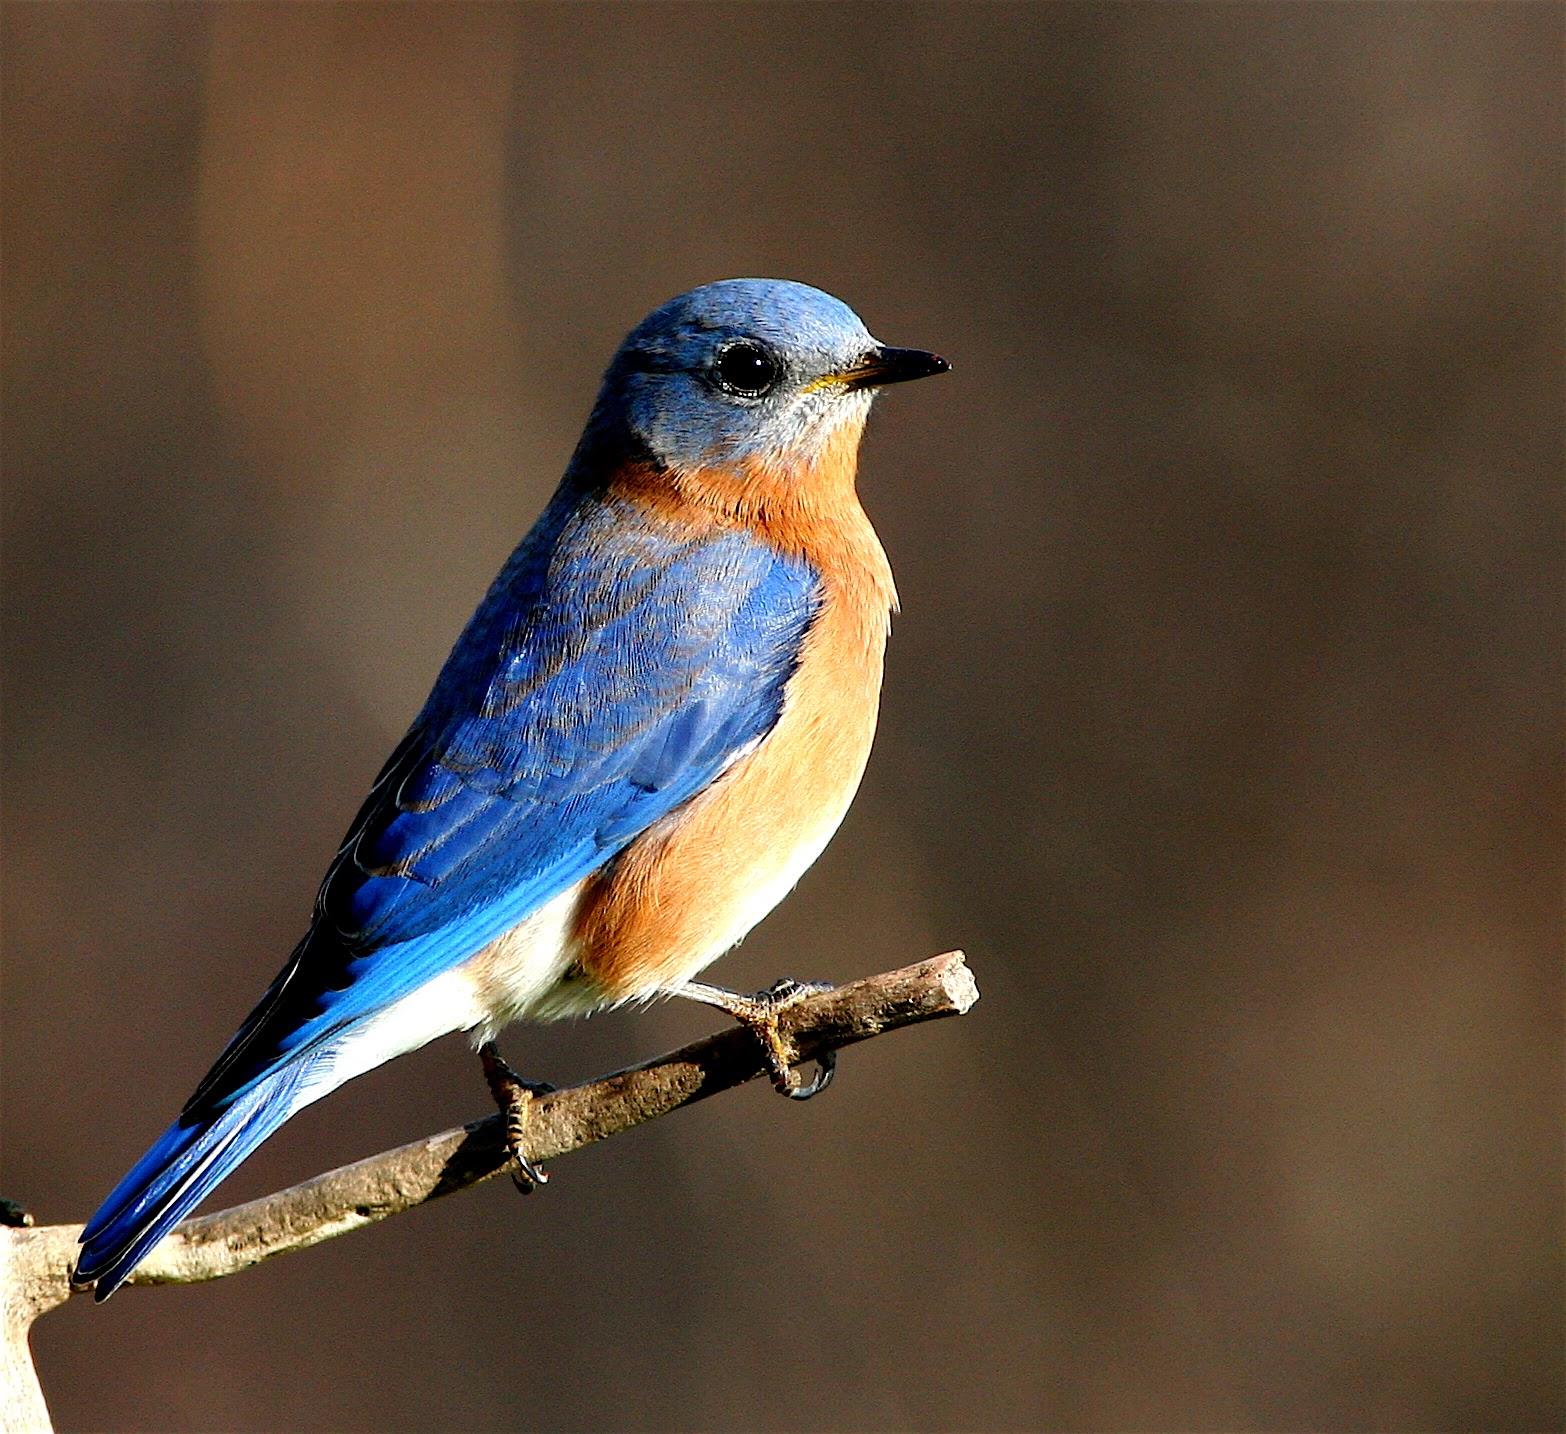 Backyard Birding Time: Yard bird list: 17 species! - Out ...